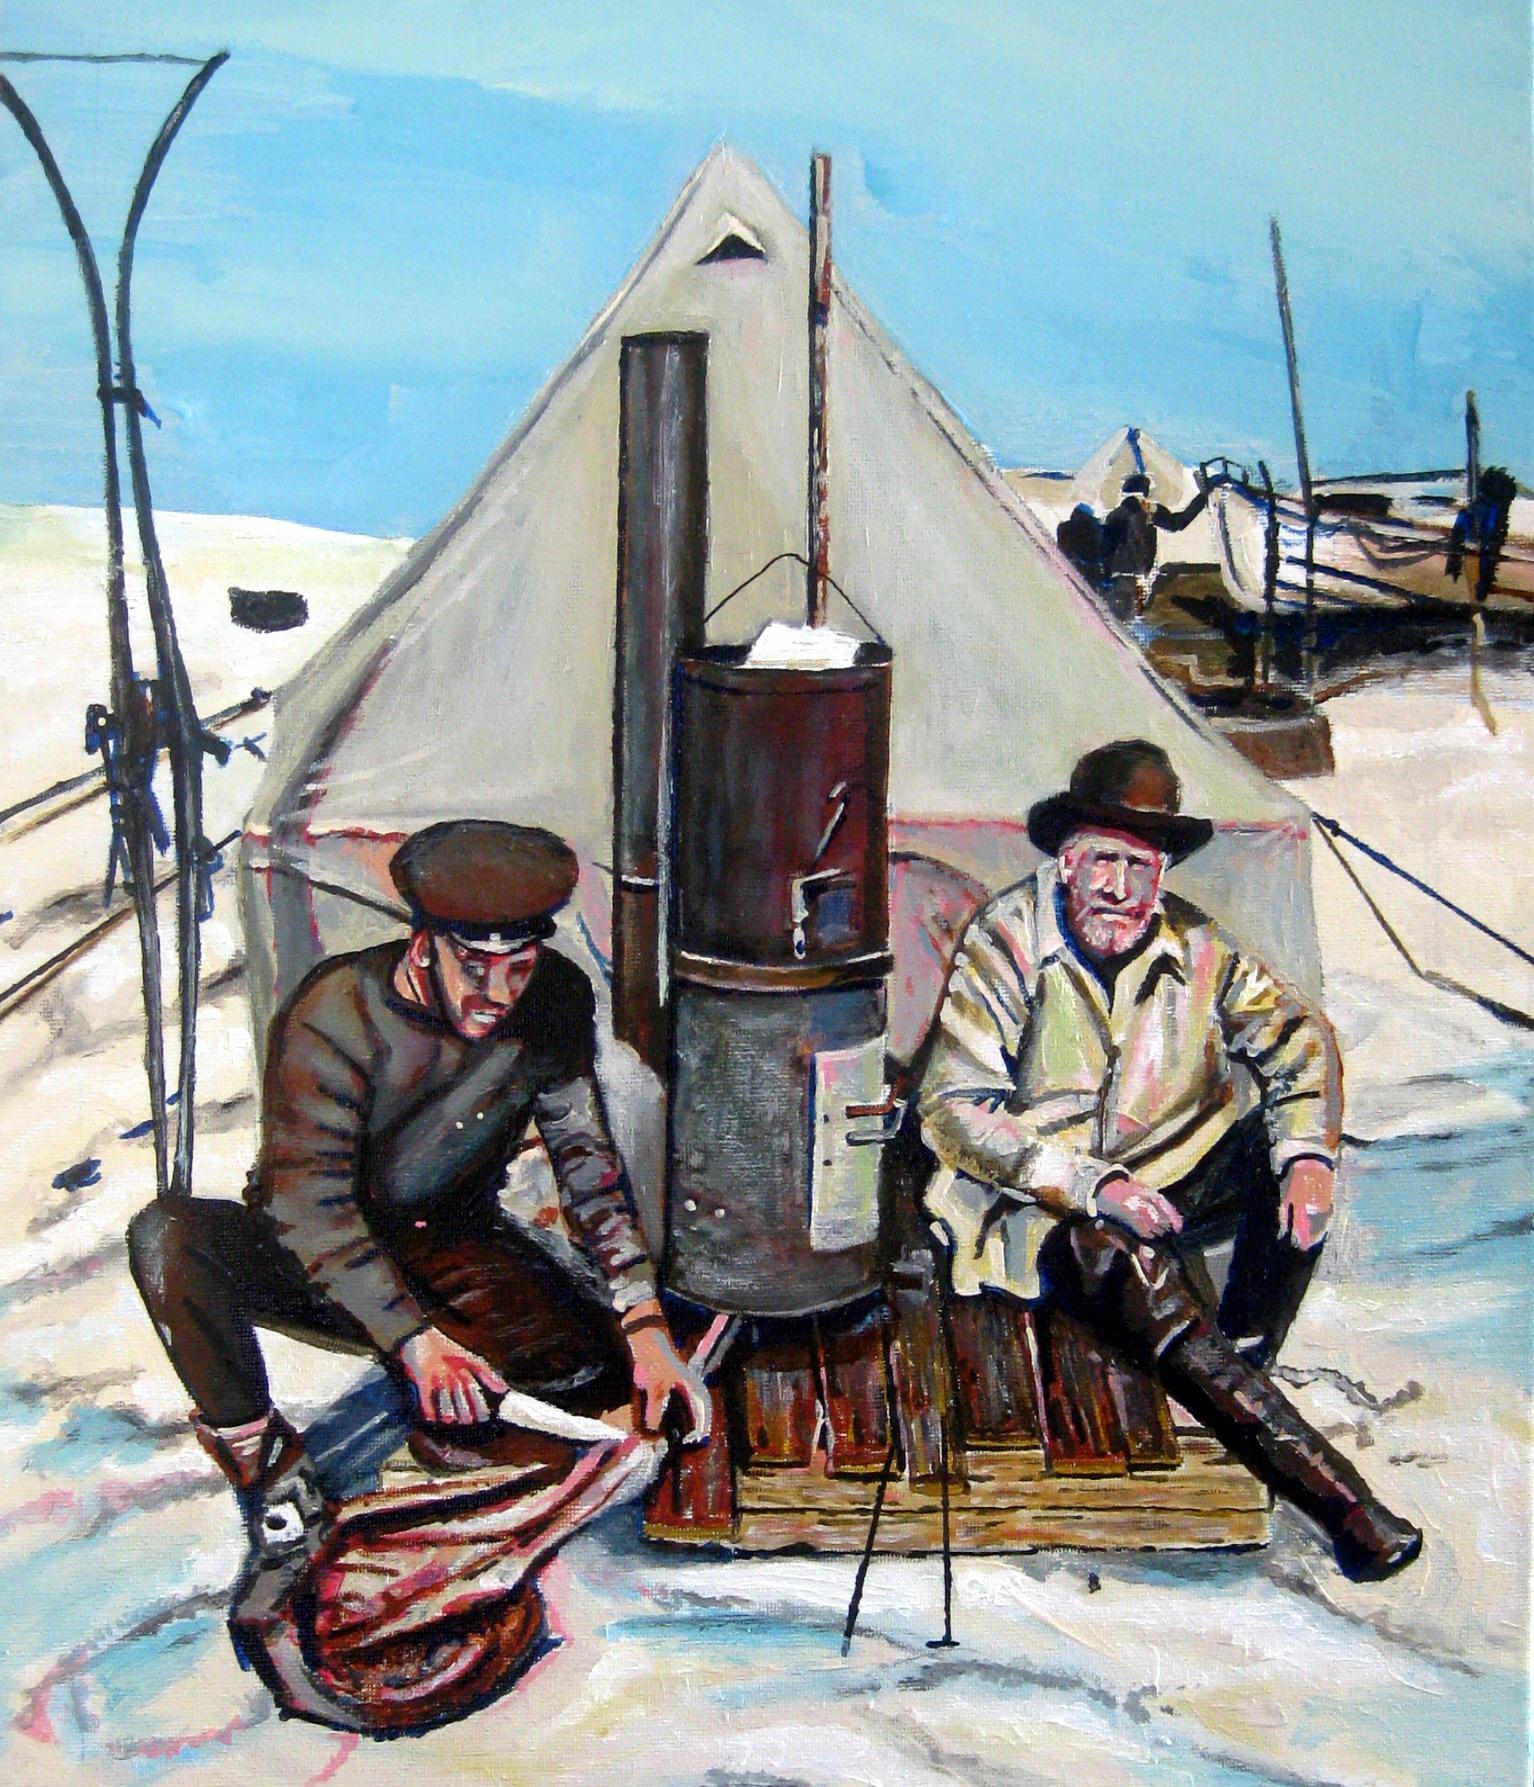 Shackleton and Hurley